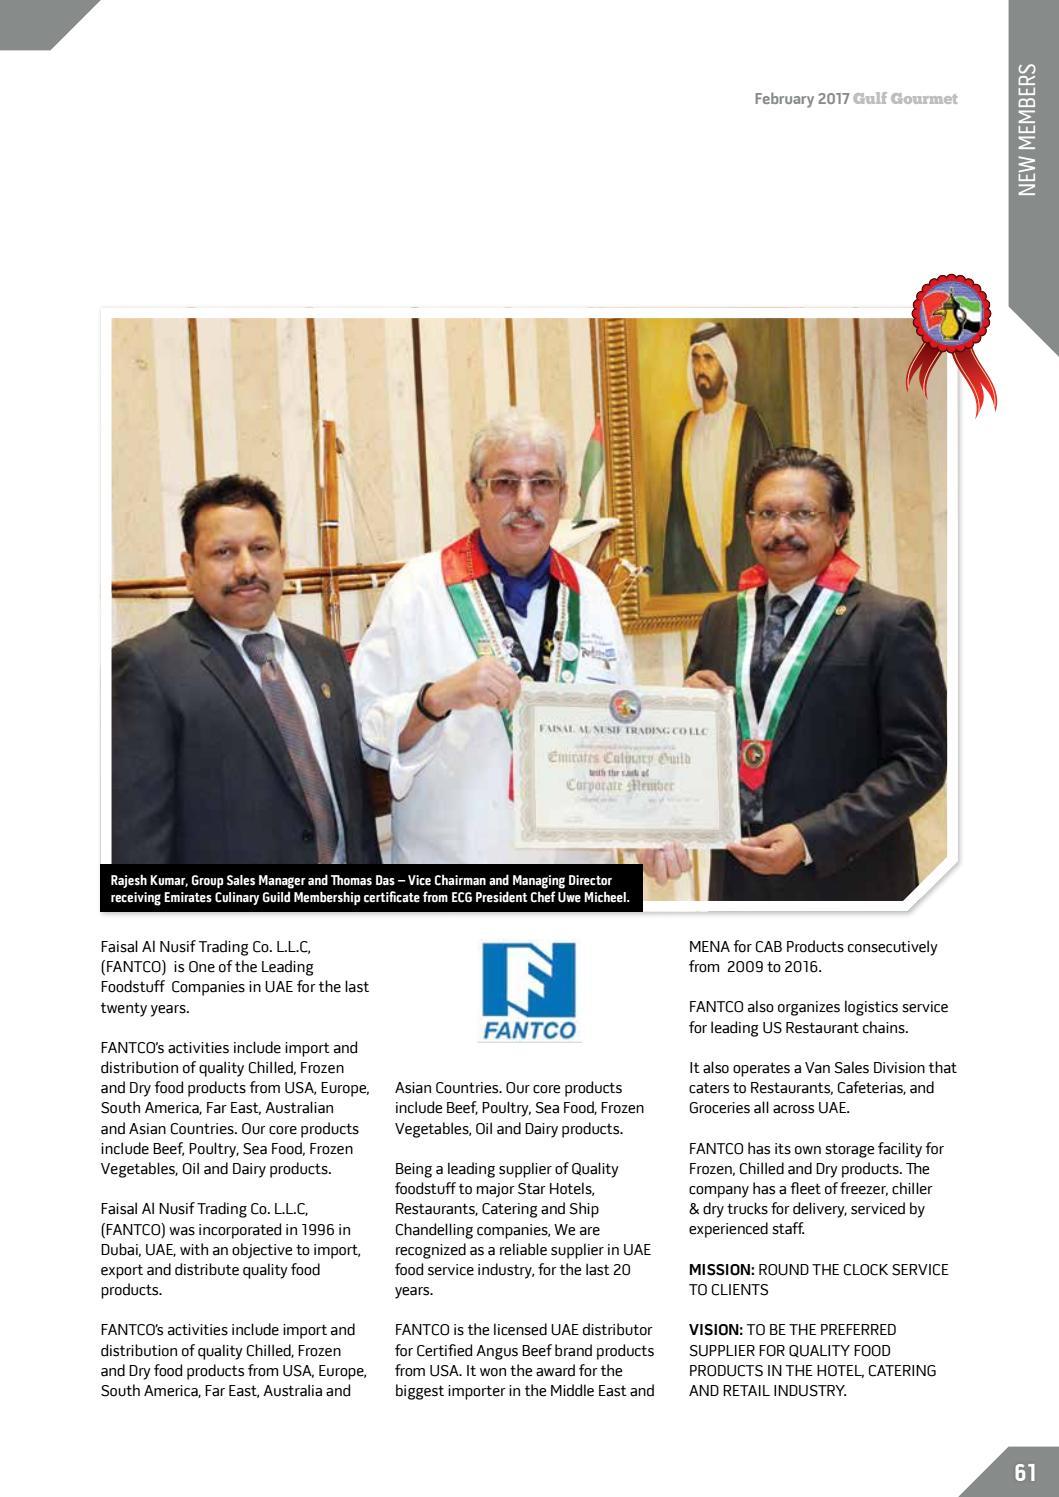 February 2017 by Gulf Gourmet magazine - issuu